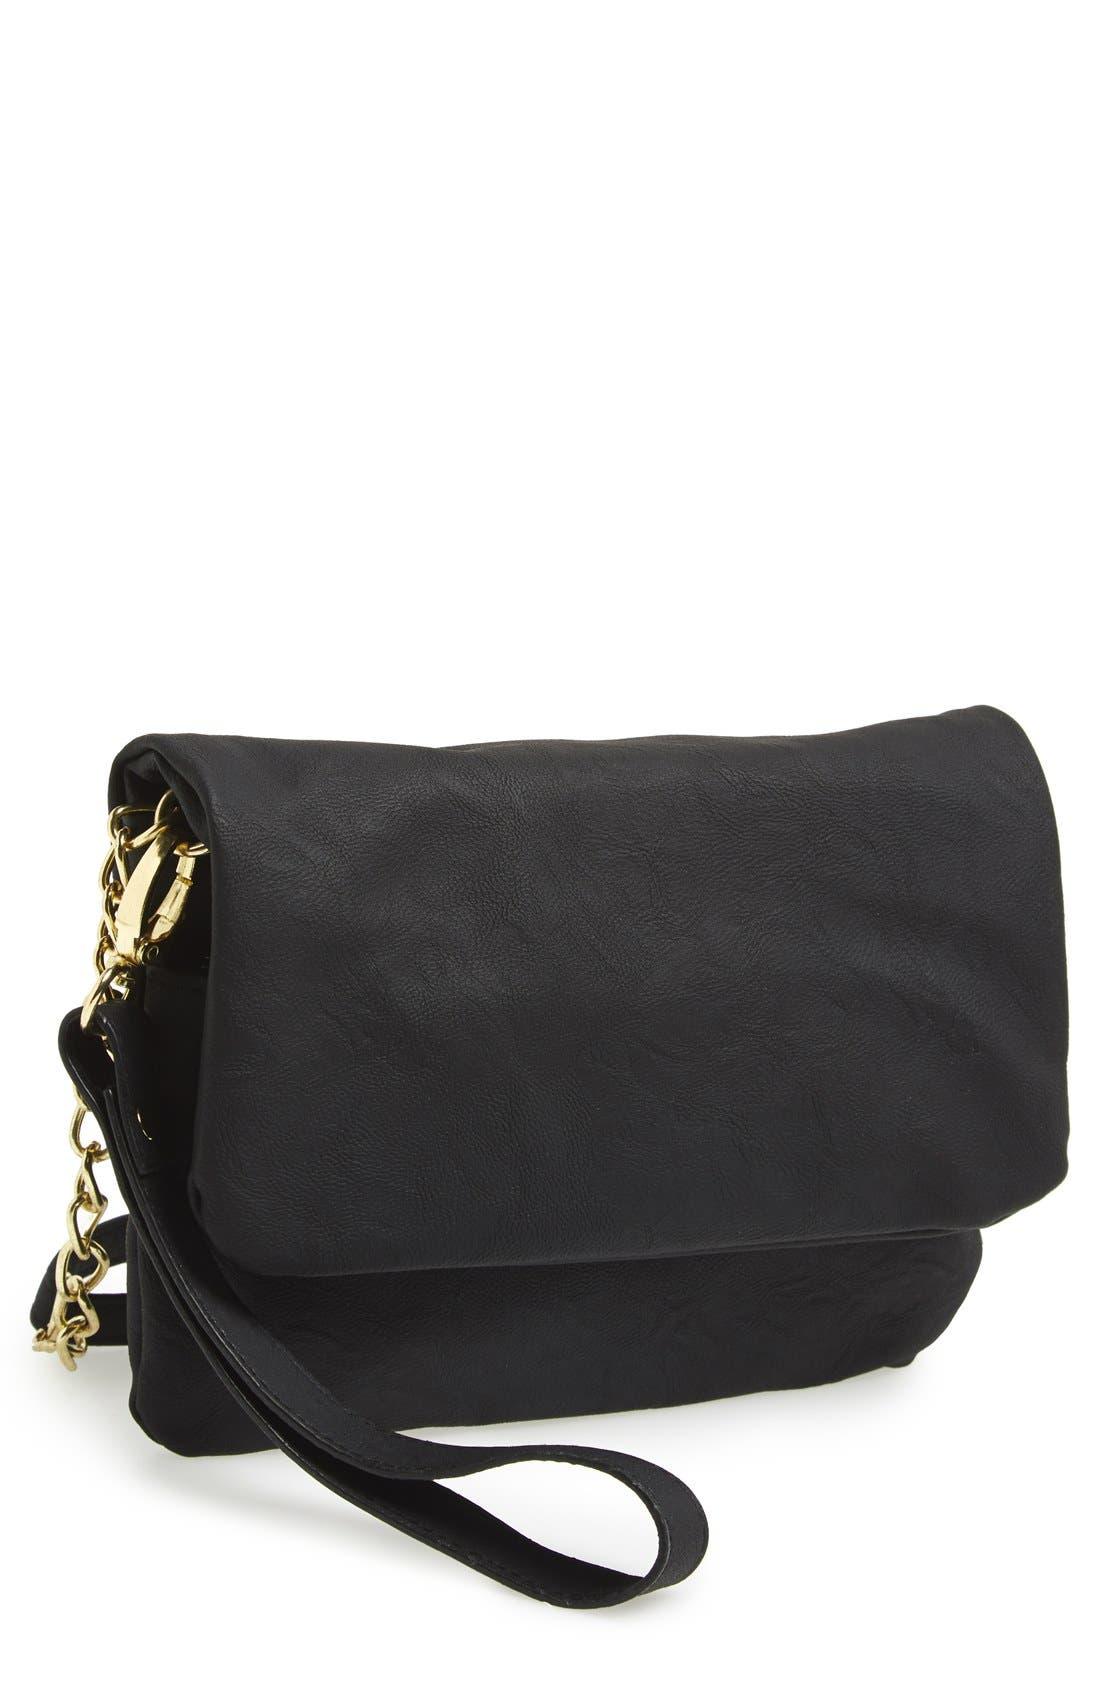 Main Image - BP. Convertible Crossbody Bag